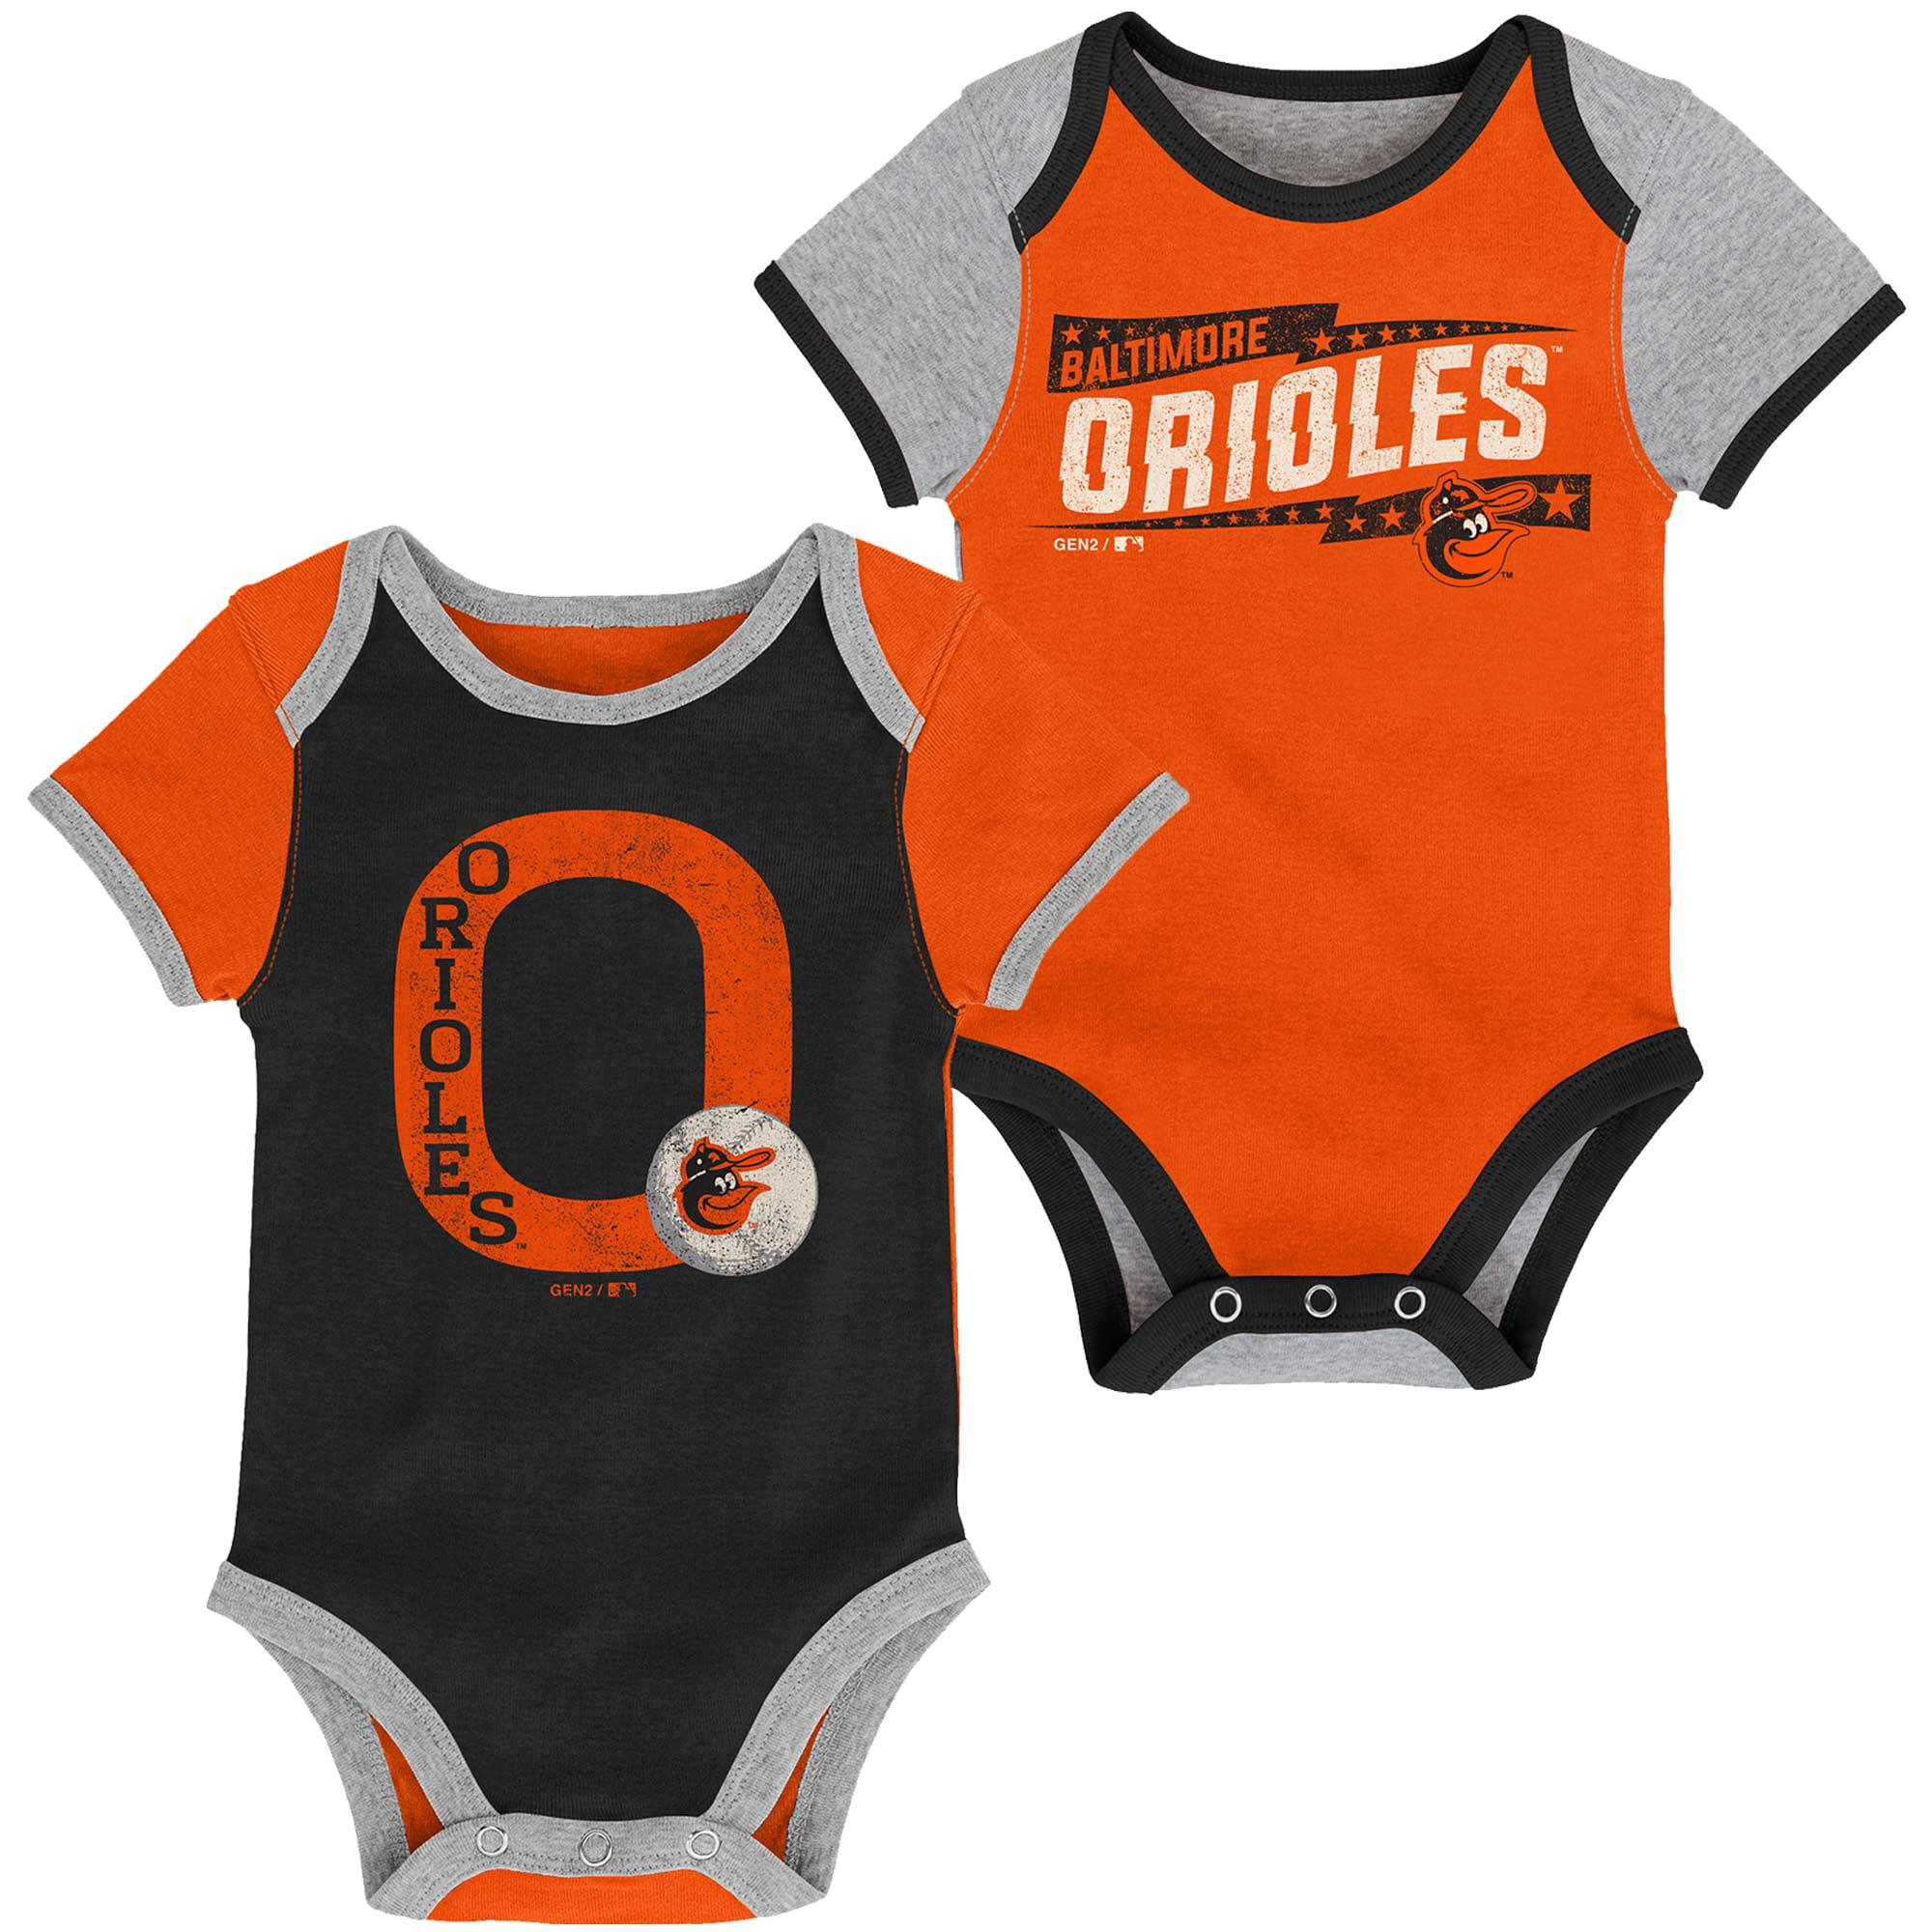 Baltimore Orioles Newborn Baseball Star Two-Pack Bodysuit Set - Black/Orange